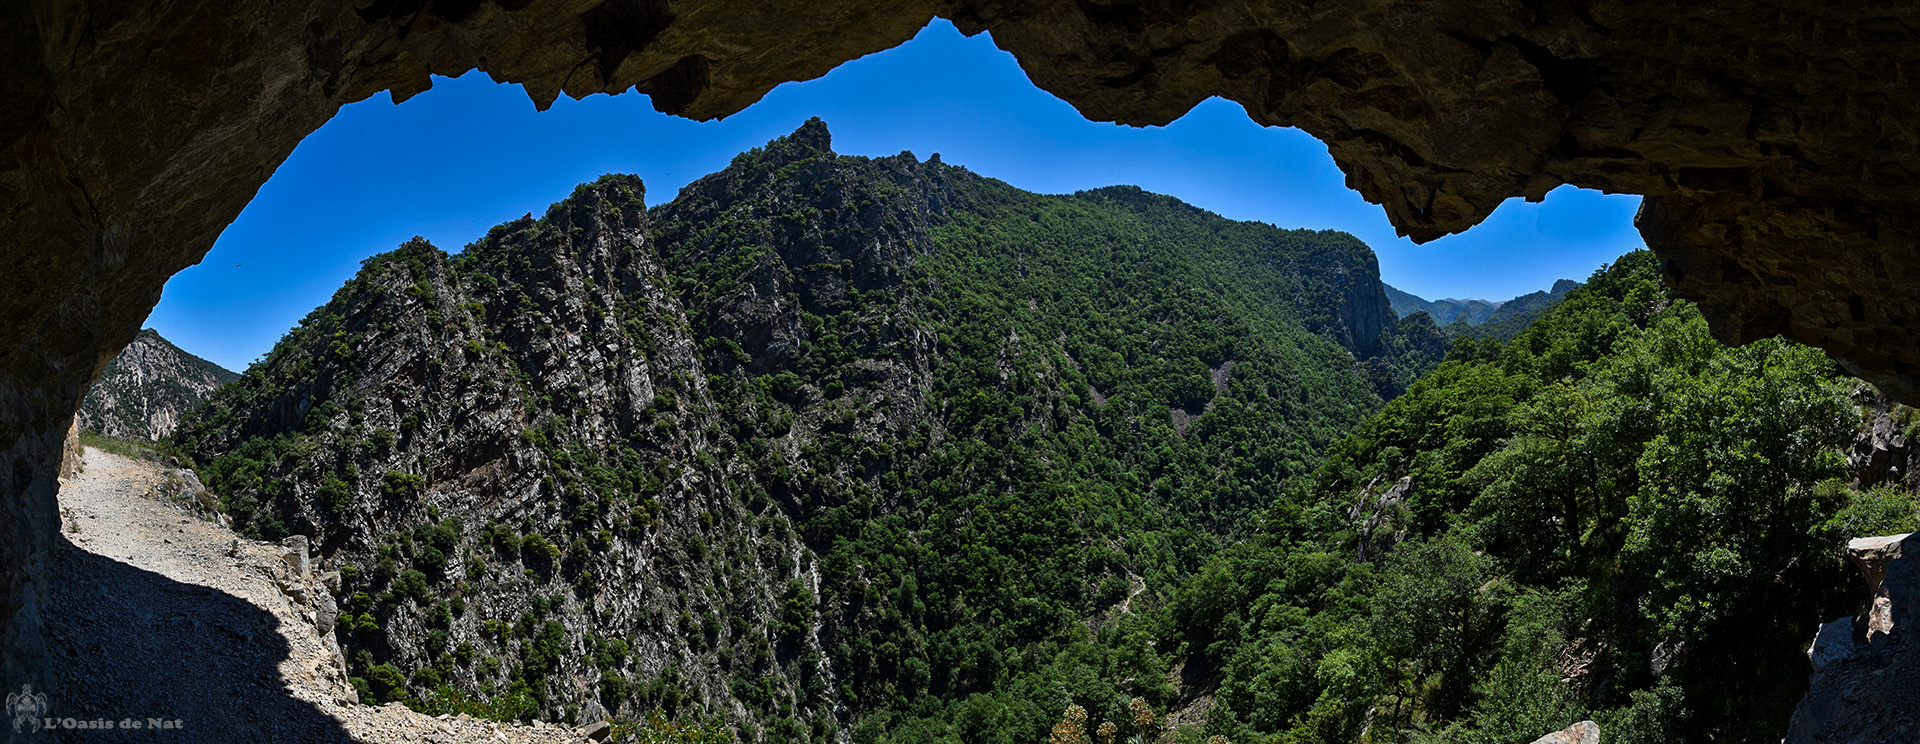 Gorges de Carança - balcon - paysage - randonéee - Pyrénées